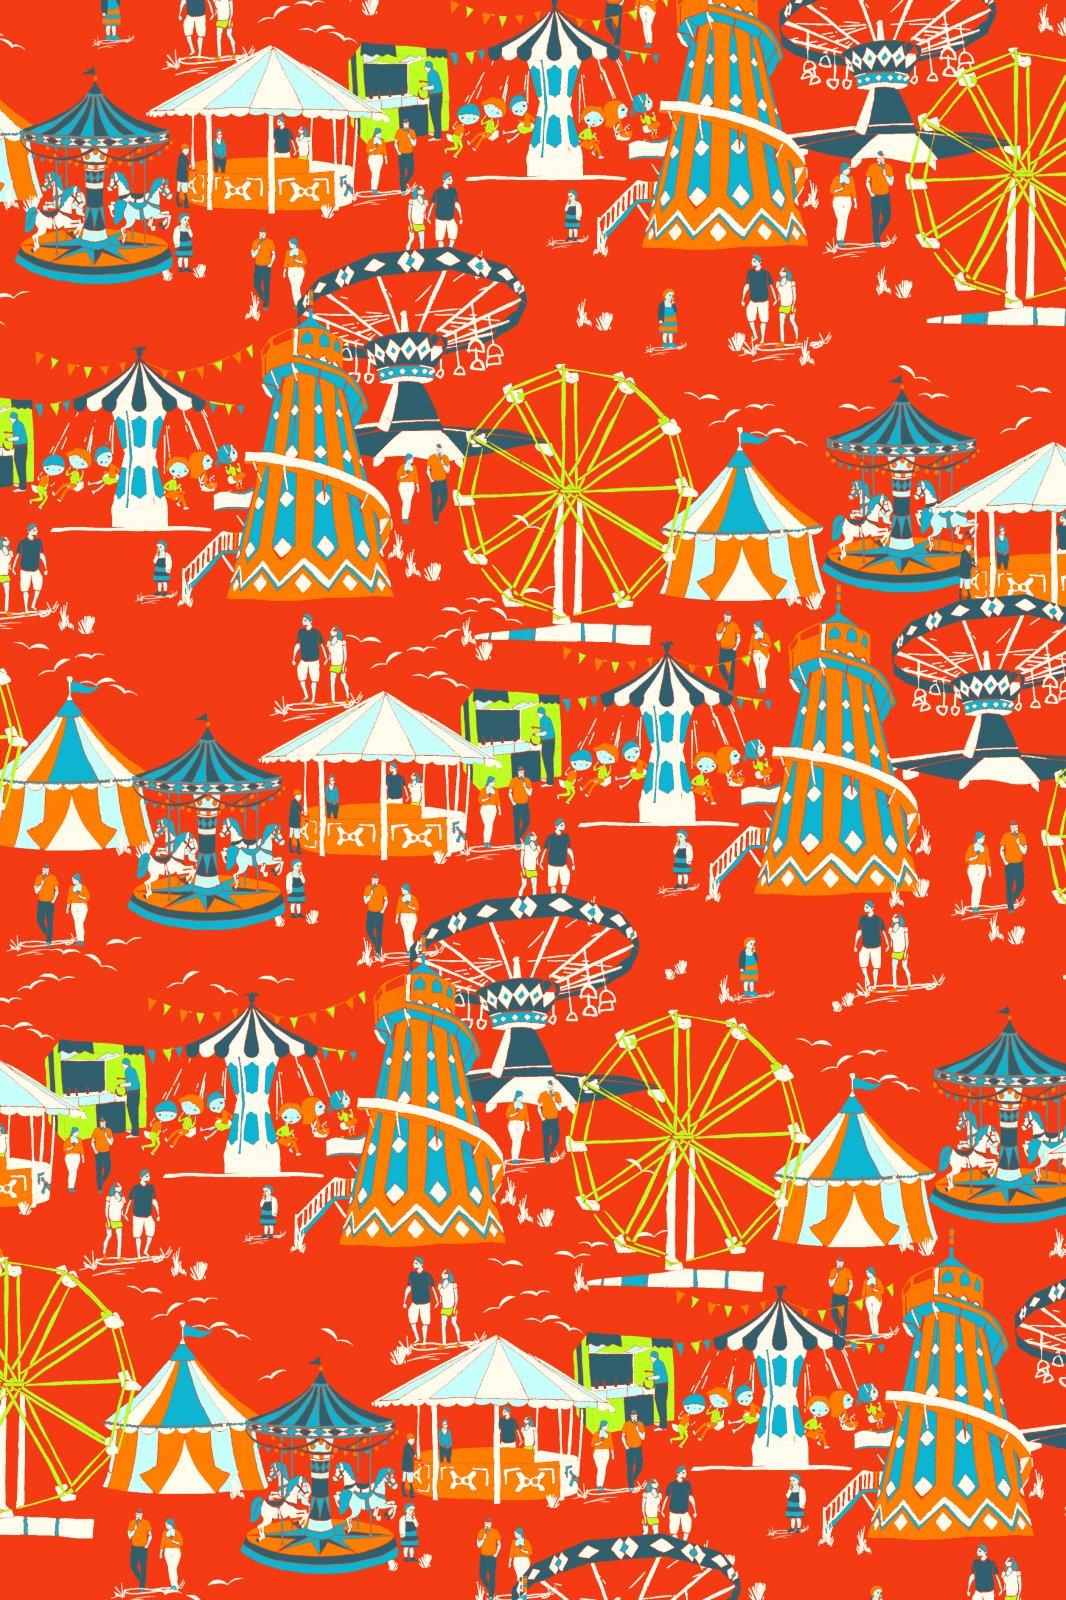 Jane Makower United Kingdom England Retro Town Fair Festival Carnival Merry Go Round UK Cotton Quilt Fabric JM05